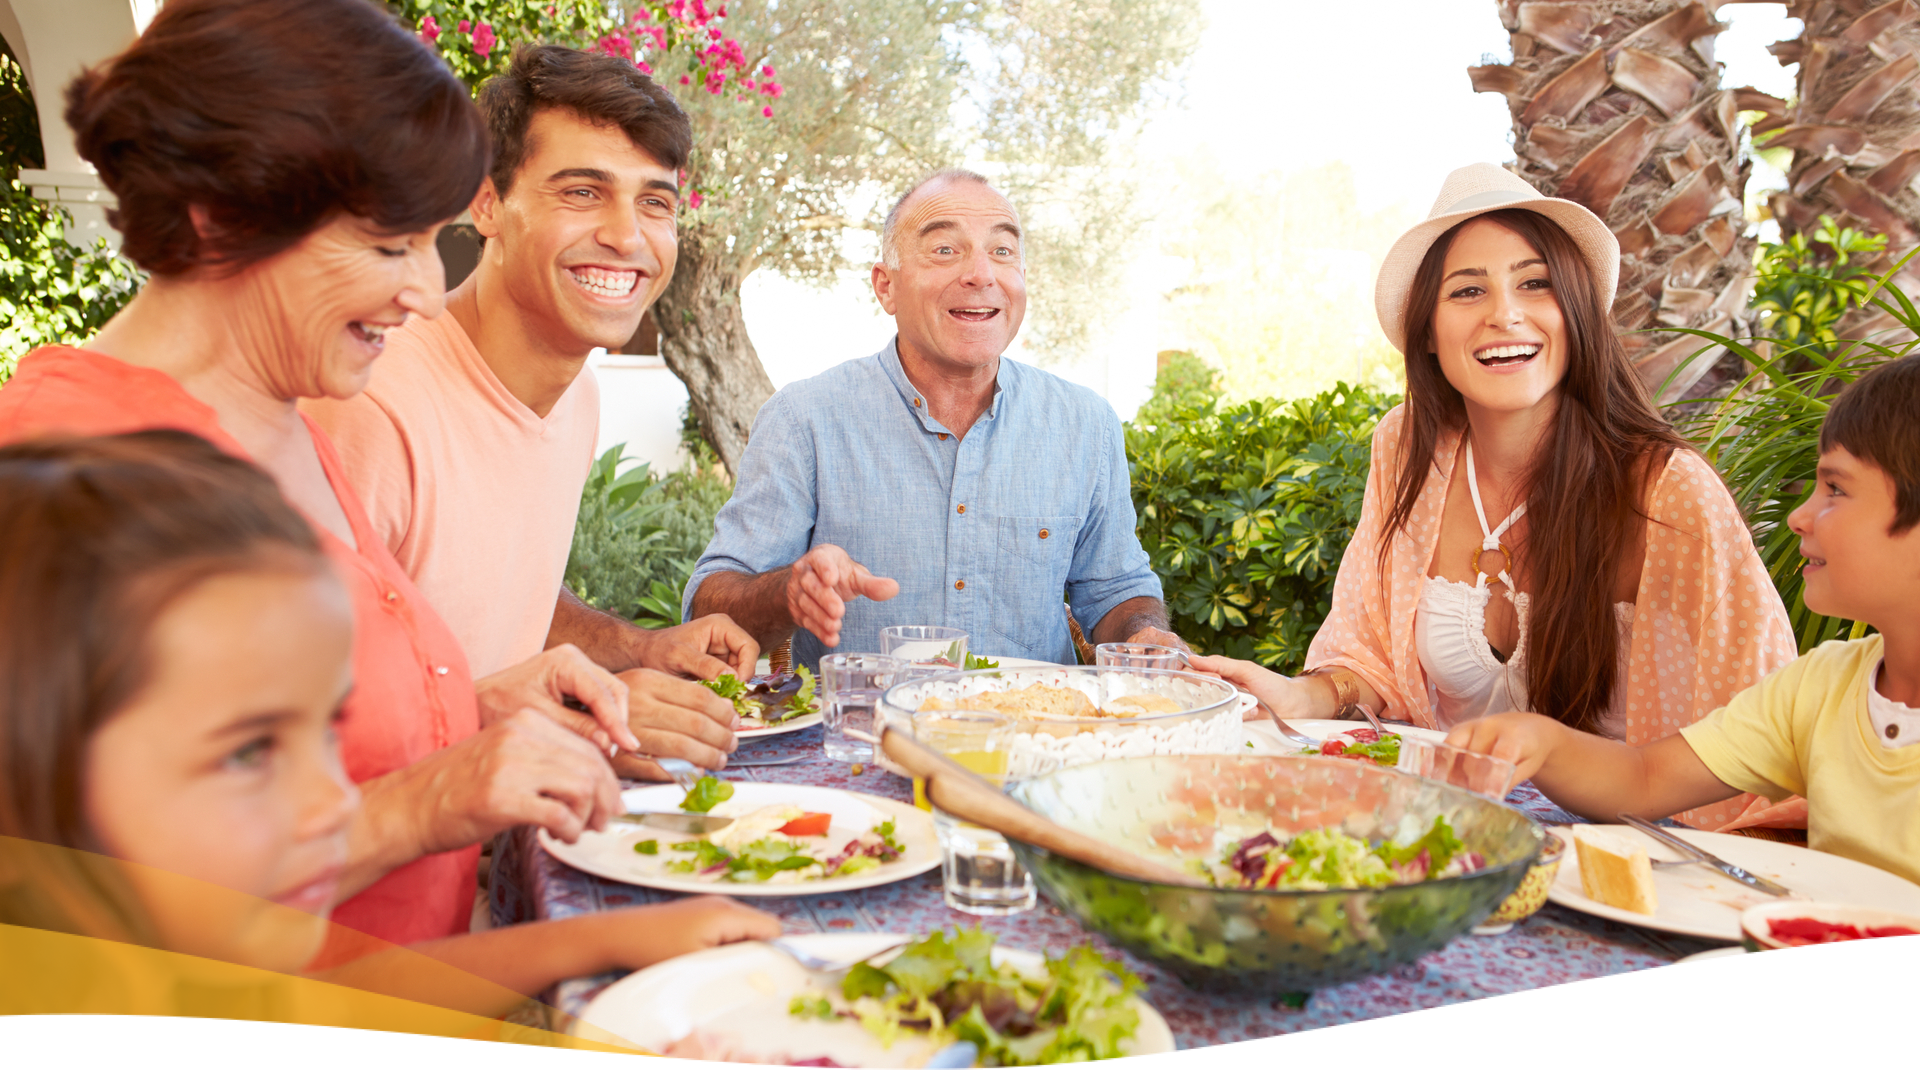 Blog ML Latinx families and money 09172018